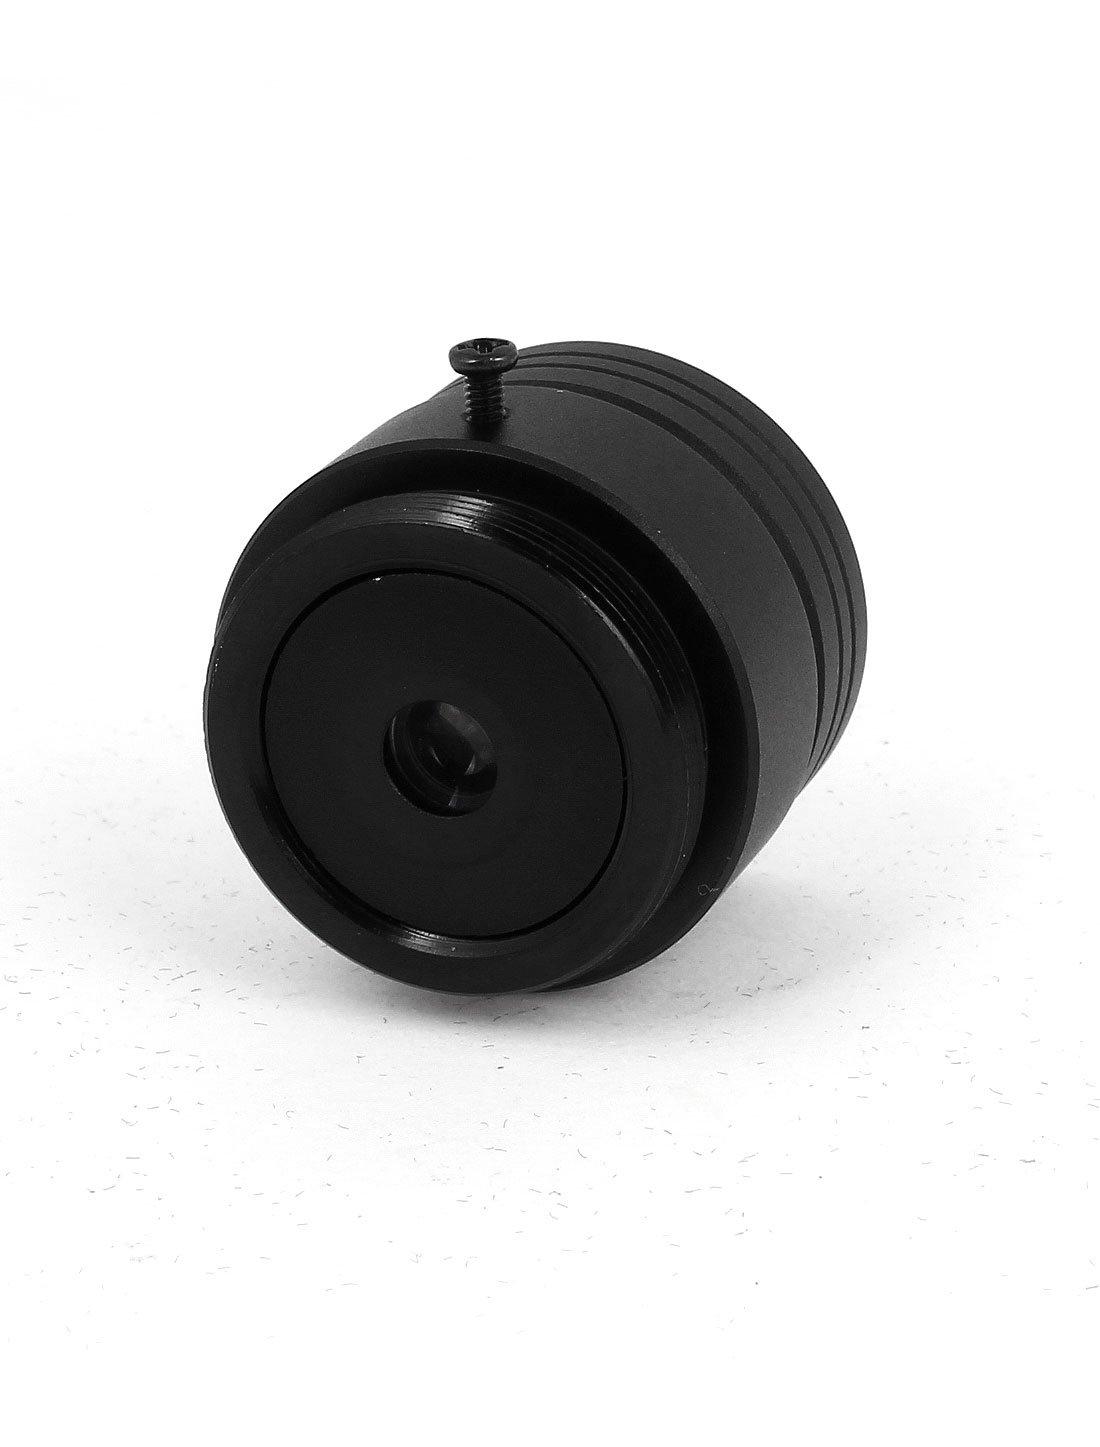 uxcell 6mm F1.2 1//2.5 CS Mount Fixed Iris Monofocal Lens for CCTV Camera